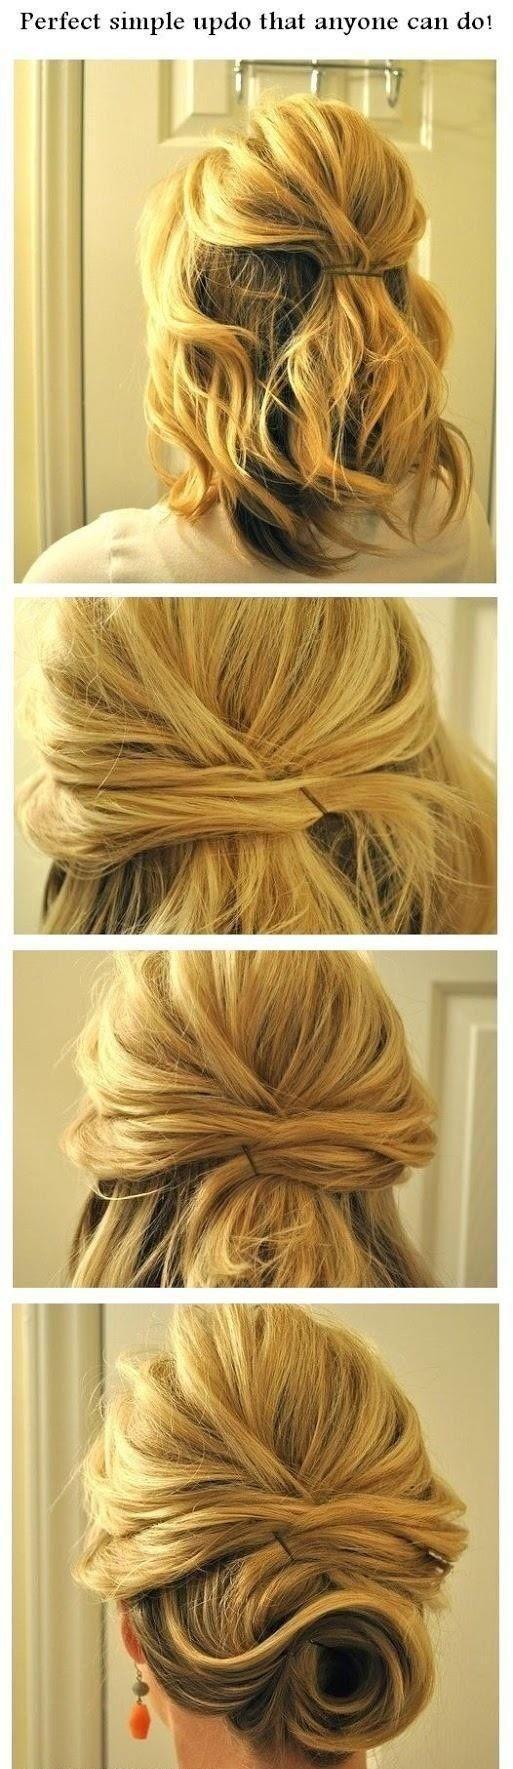 15 Cute and Easy Hairstyle Tutorials For Medium-Length Hair